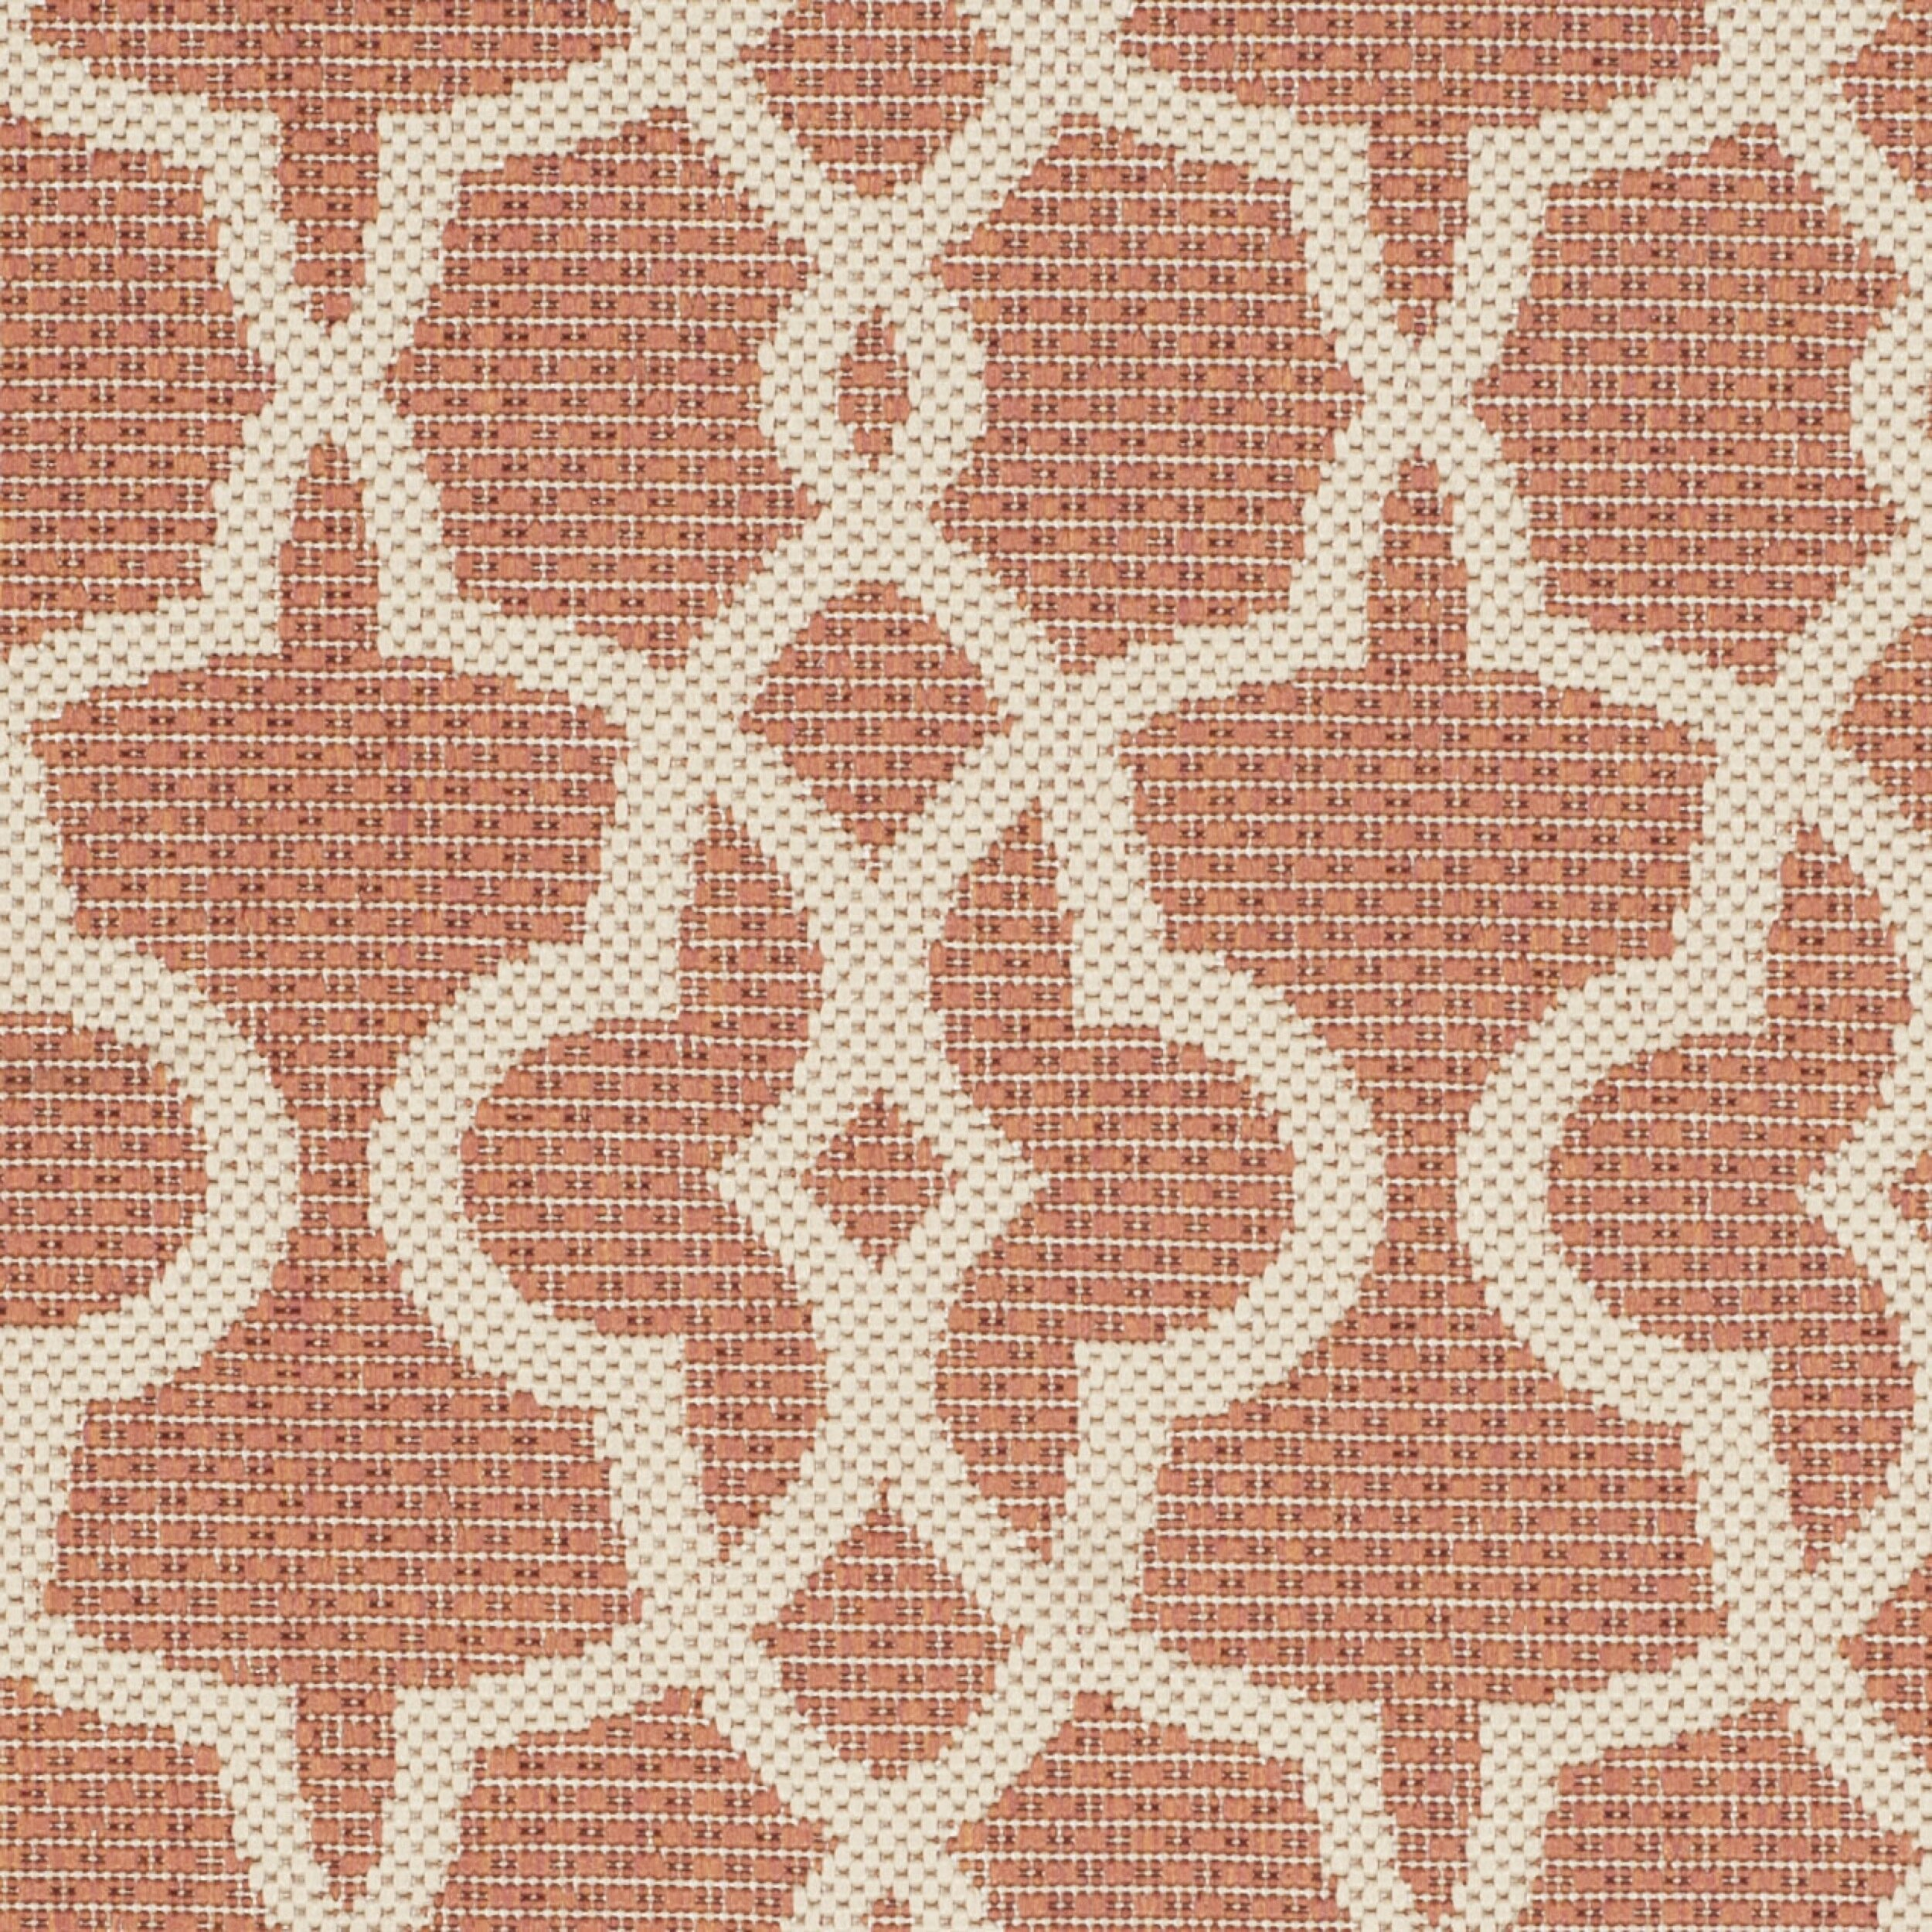 Safavieh Courtyard Terracotta Beige Rug Amp Reviews Wayfair